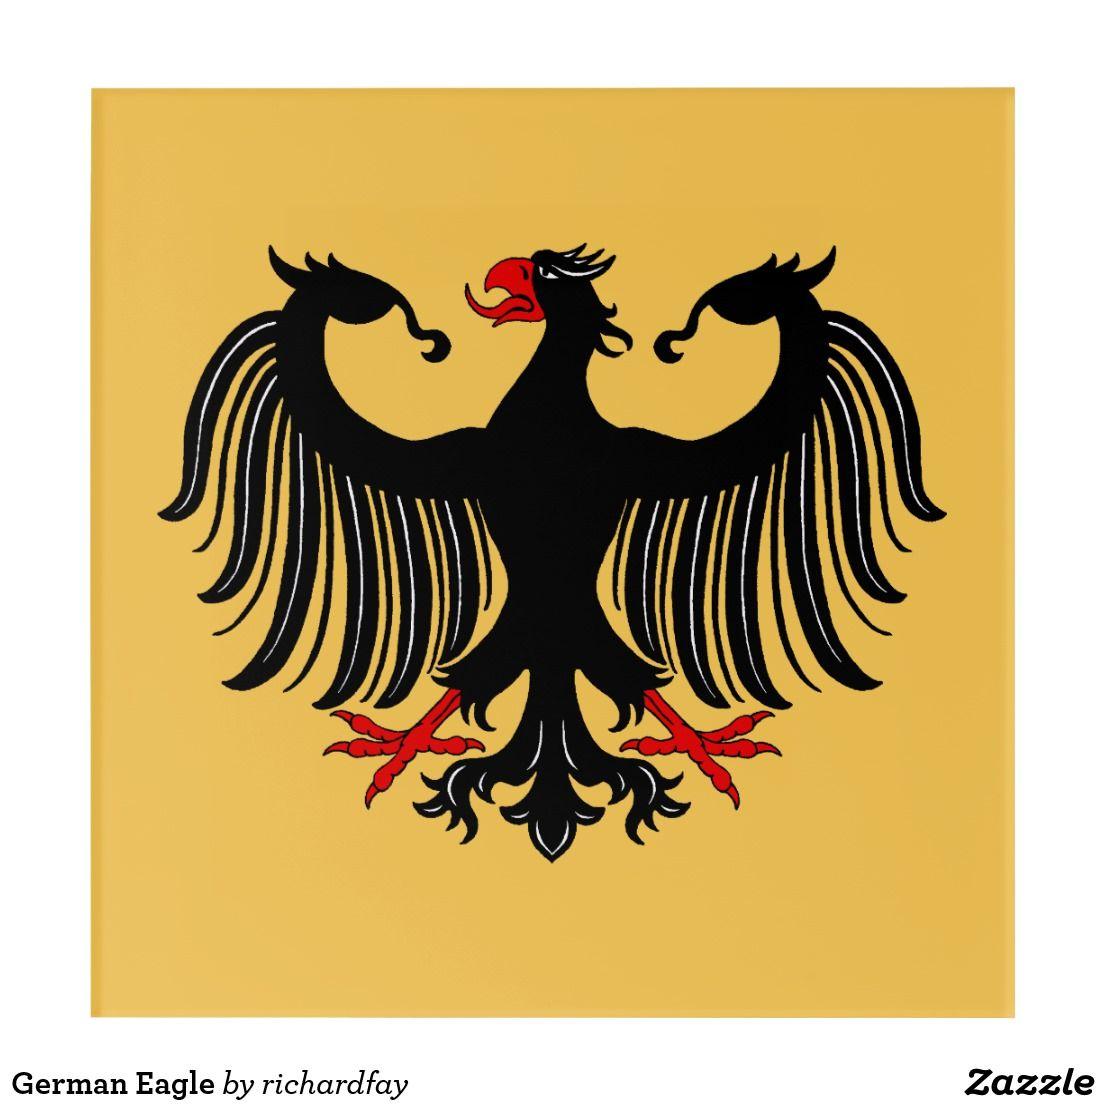 German Eagle Acrylic Wall Art | My Zazzle Products | Pinterest ...